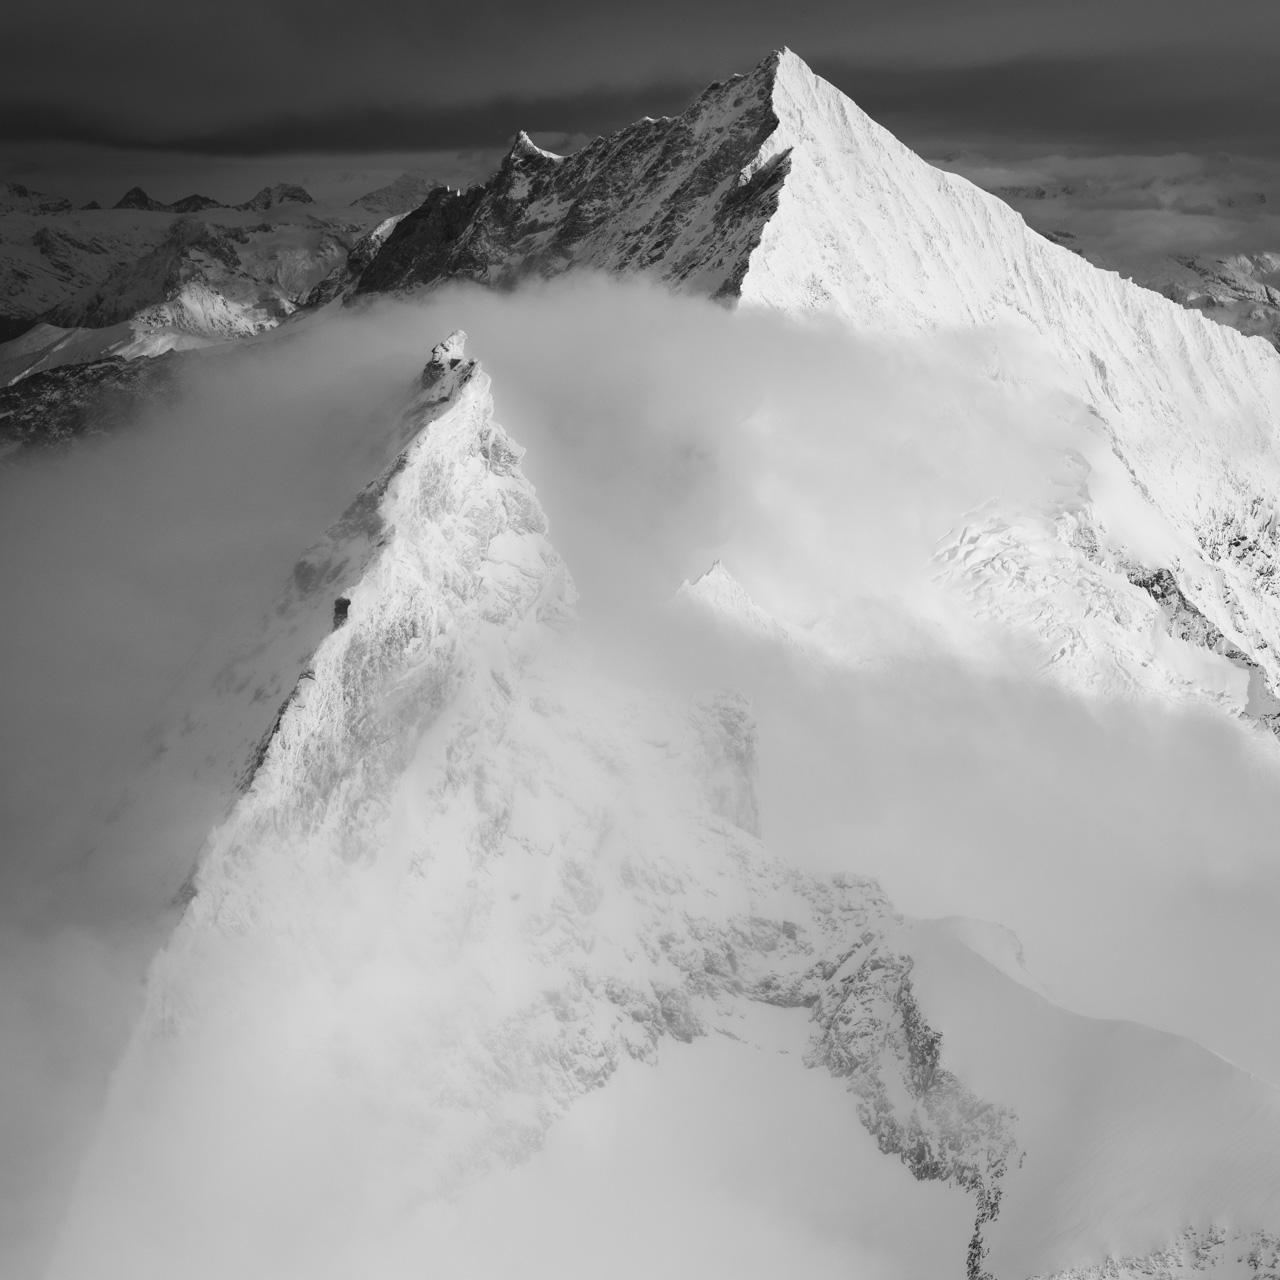 photo montagne noir et blanc neige zermatt